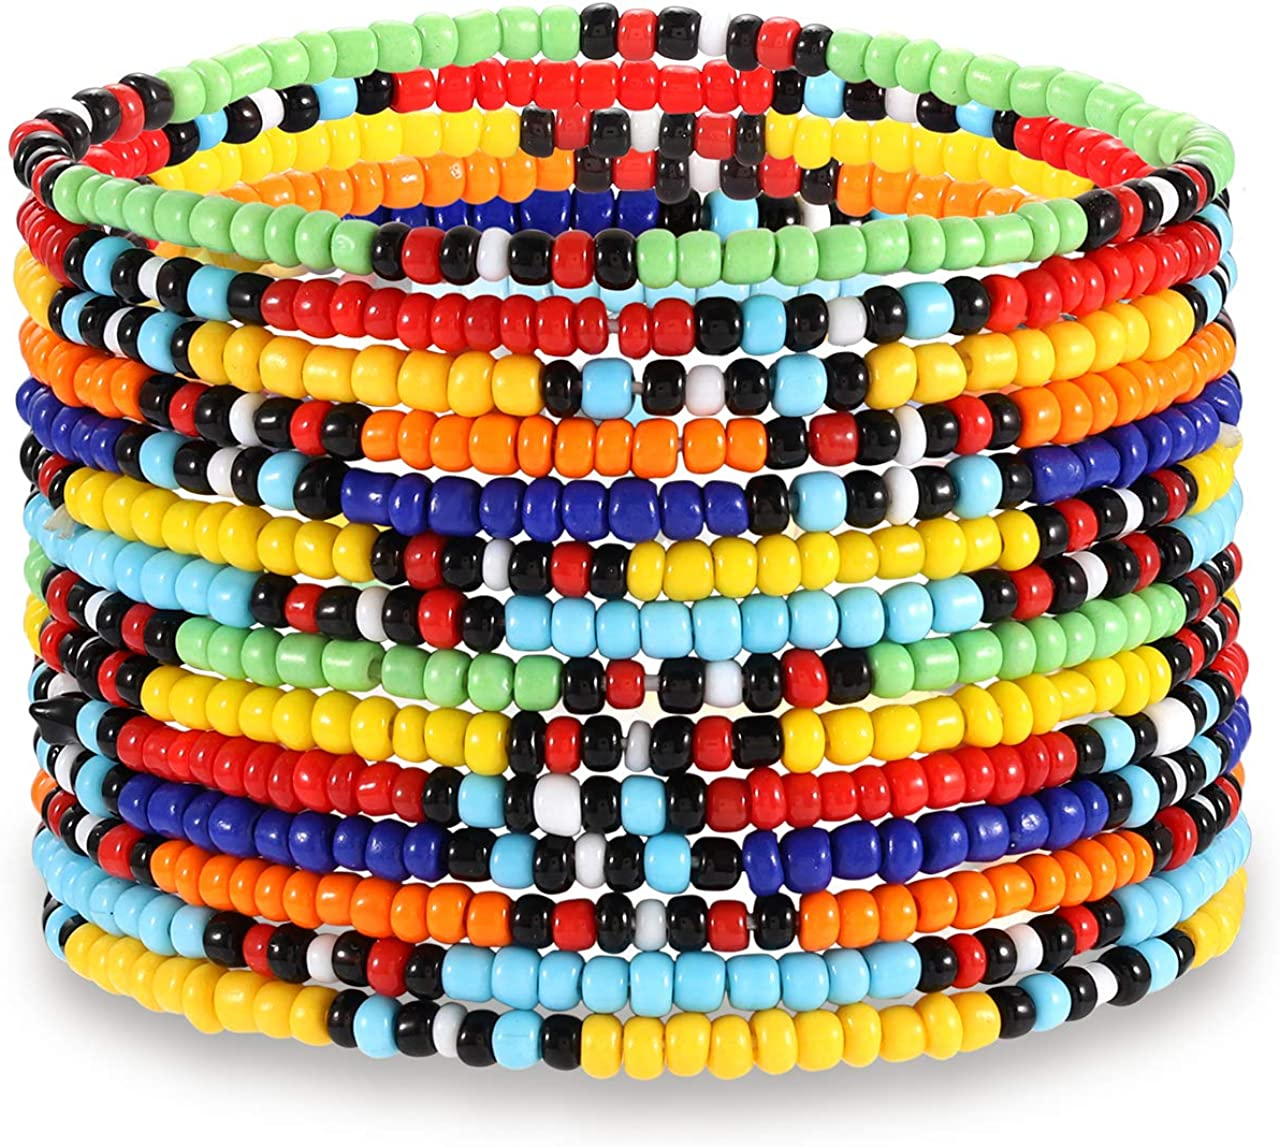 HEIDKRUEGER Seed Bead Stretch Bracelets Colorful Rainbow Tiny Beaded Stackable Vsco Bracelets Boho Summer Vacation Adjustable Bangle Bracelet for Women Girls 14Pcs